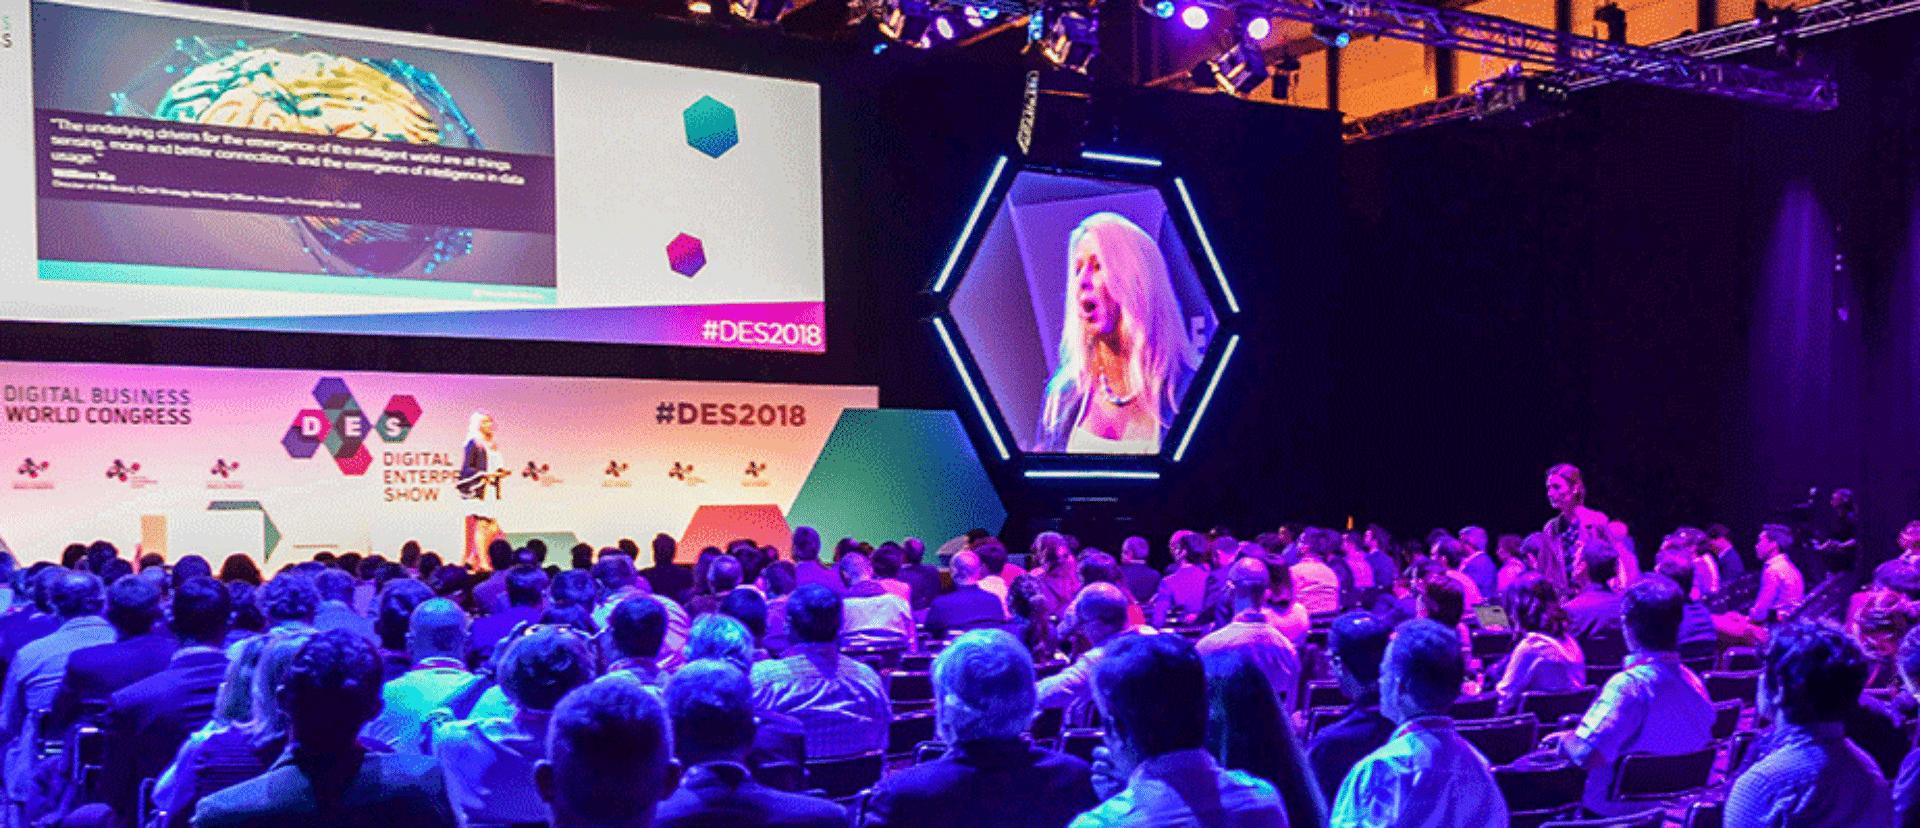 Feria de Madrid acoge el Digital Business World Congress